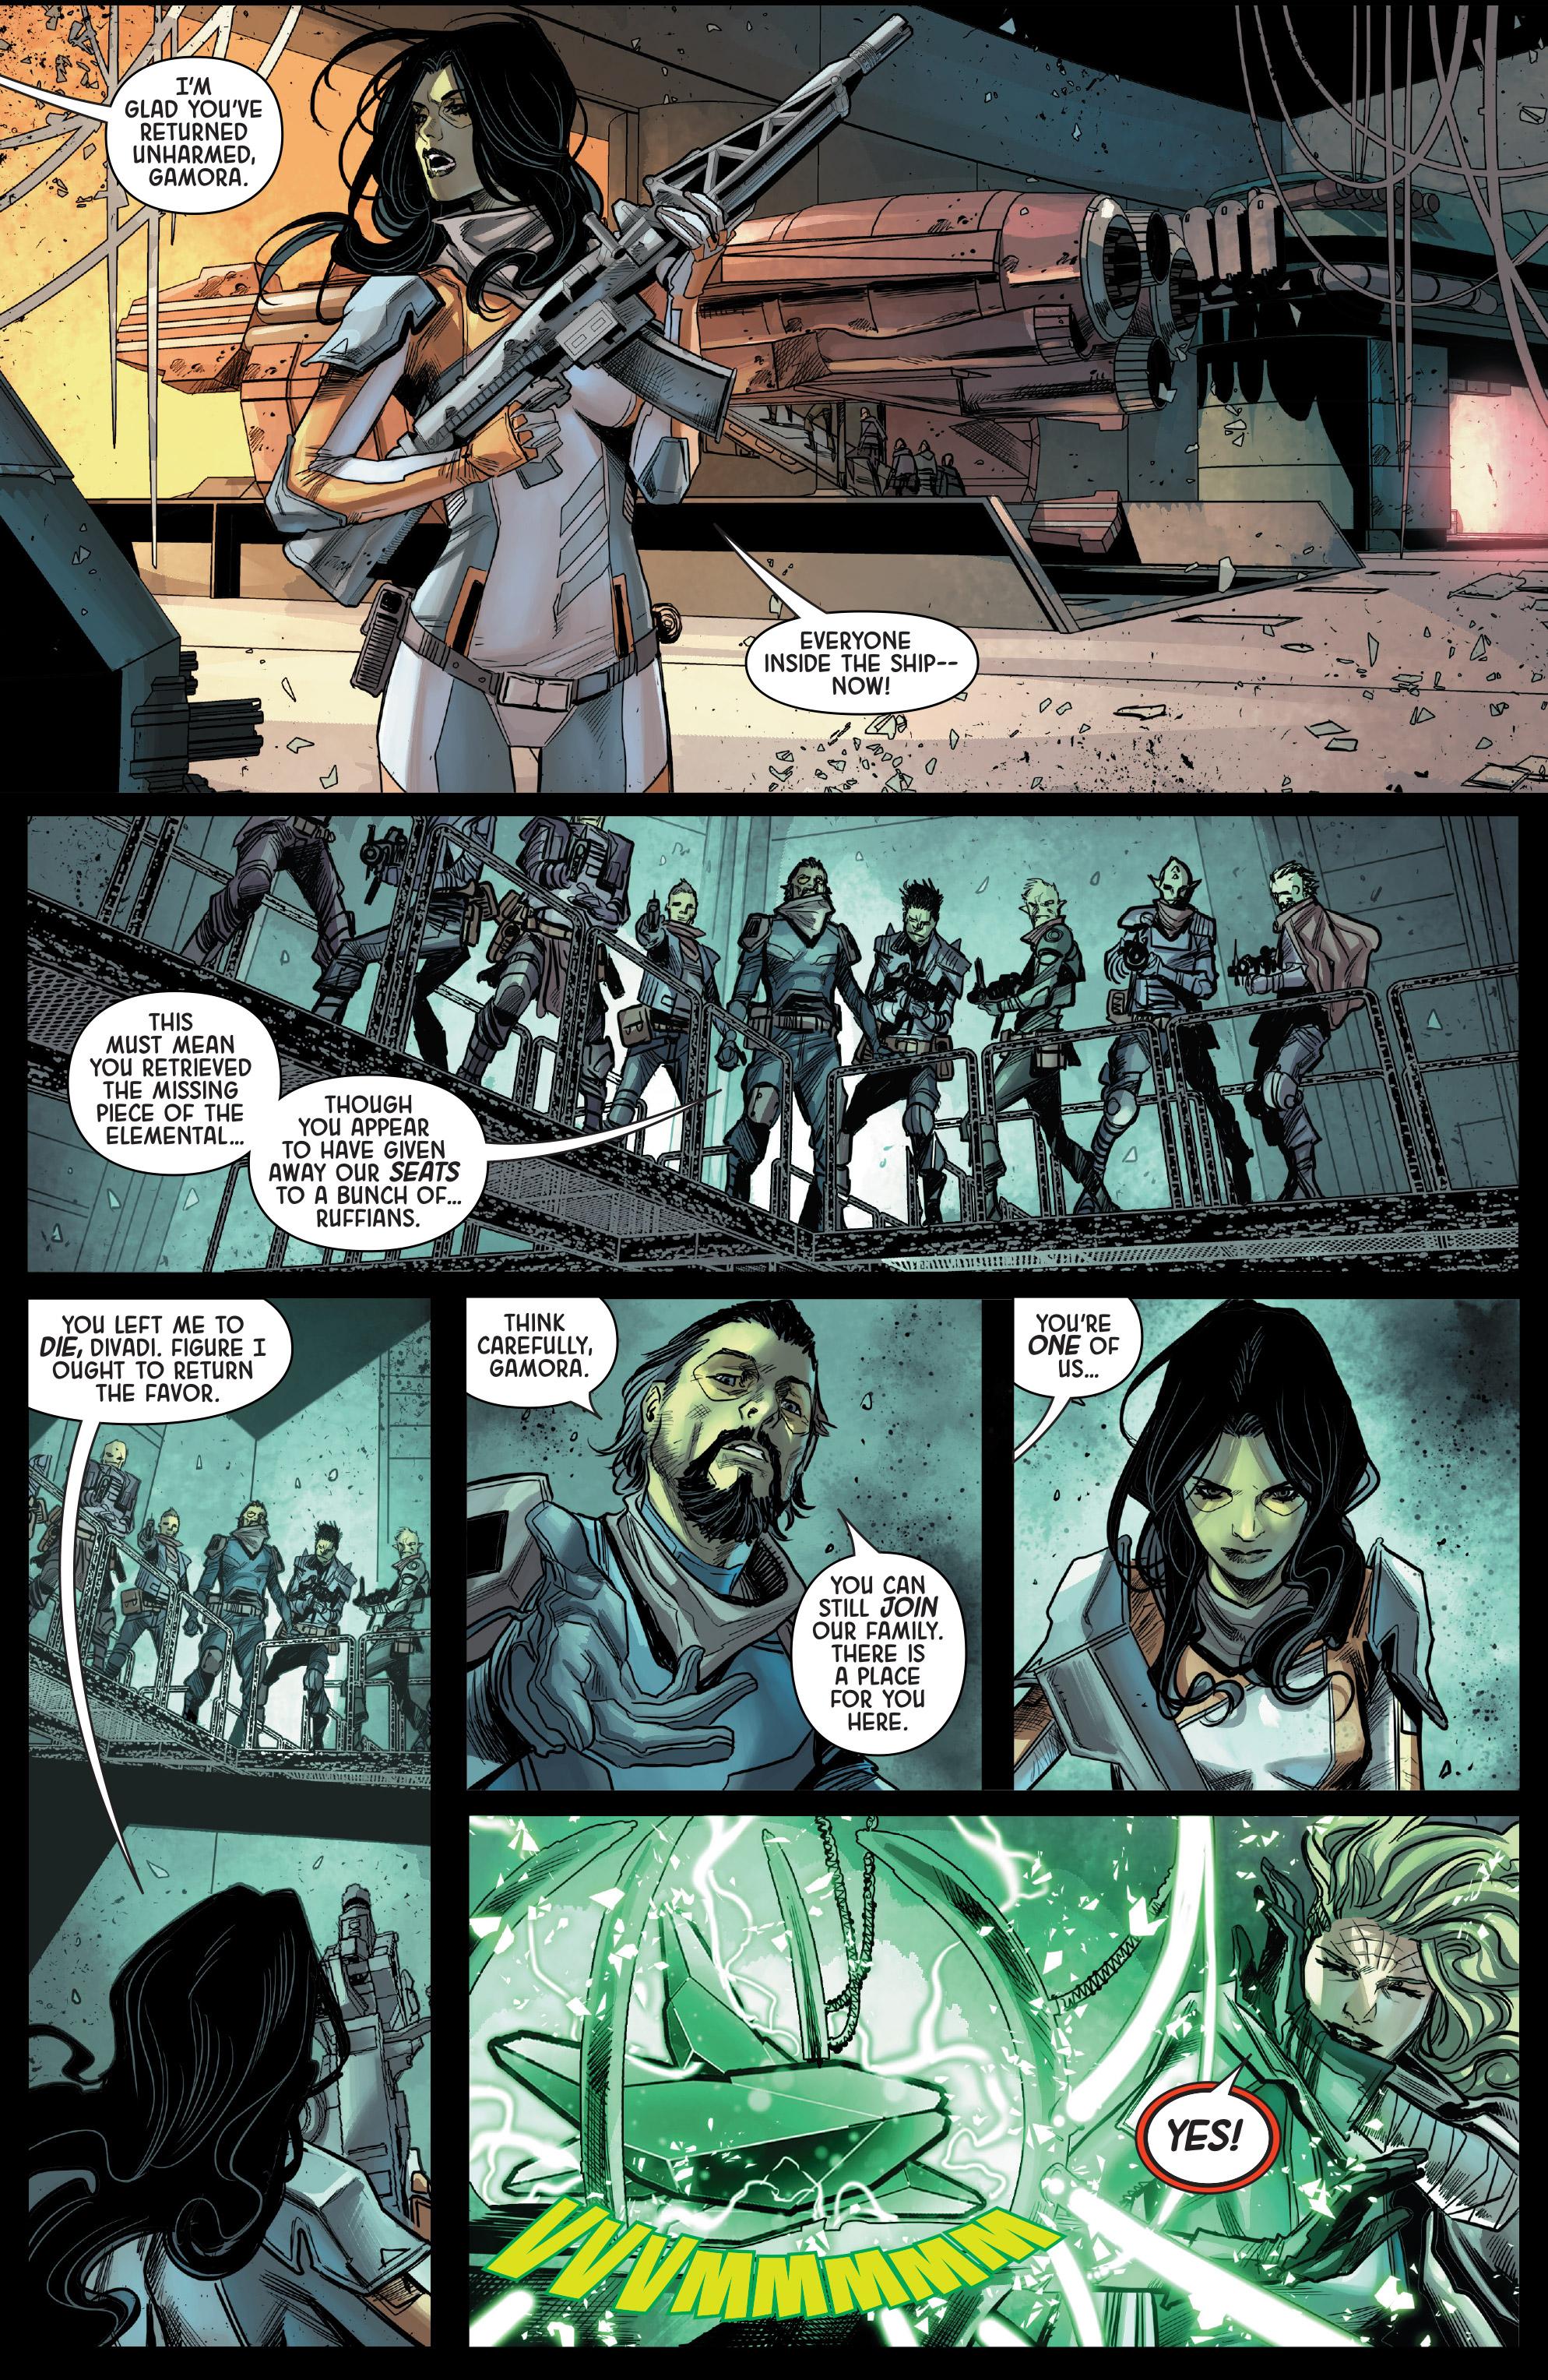 Read online Gamora comic -  Issue #5 - 10